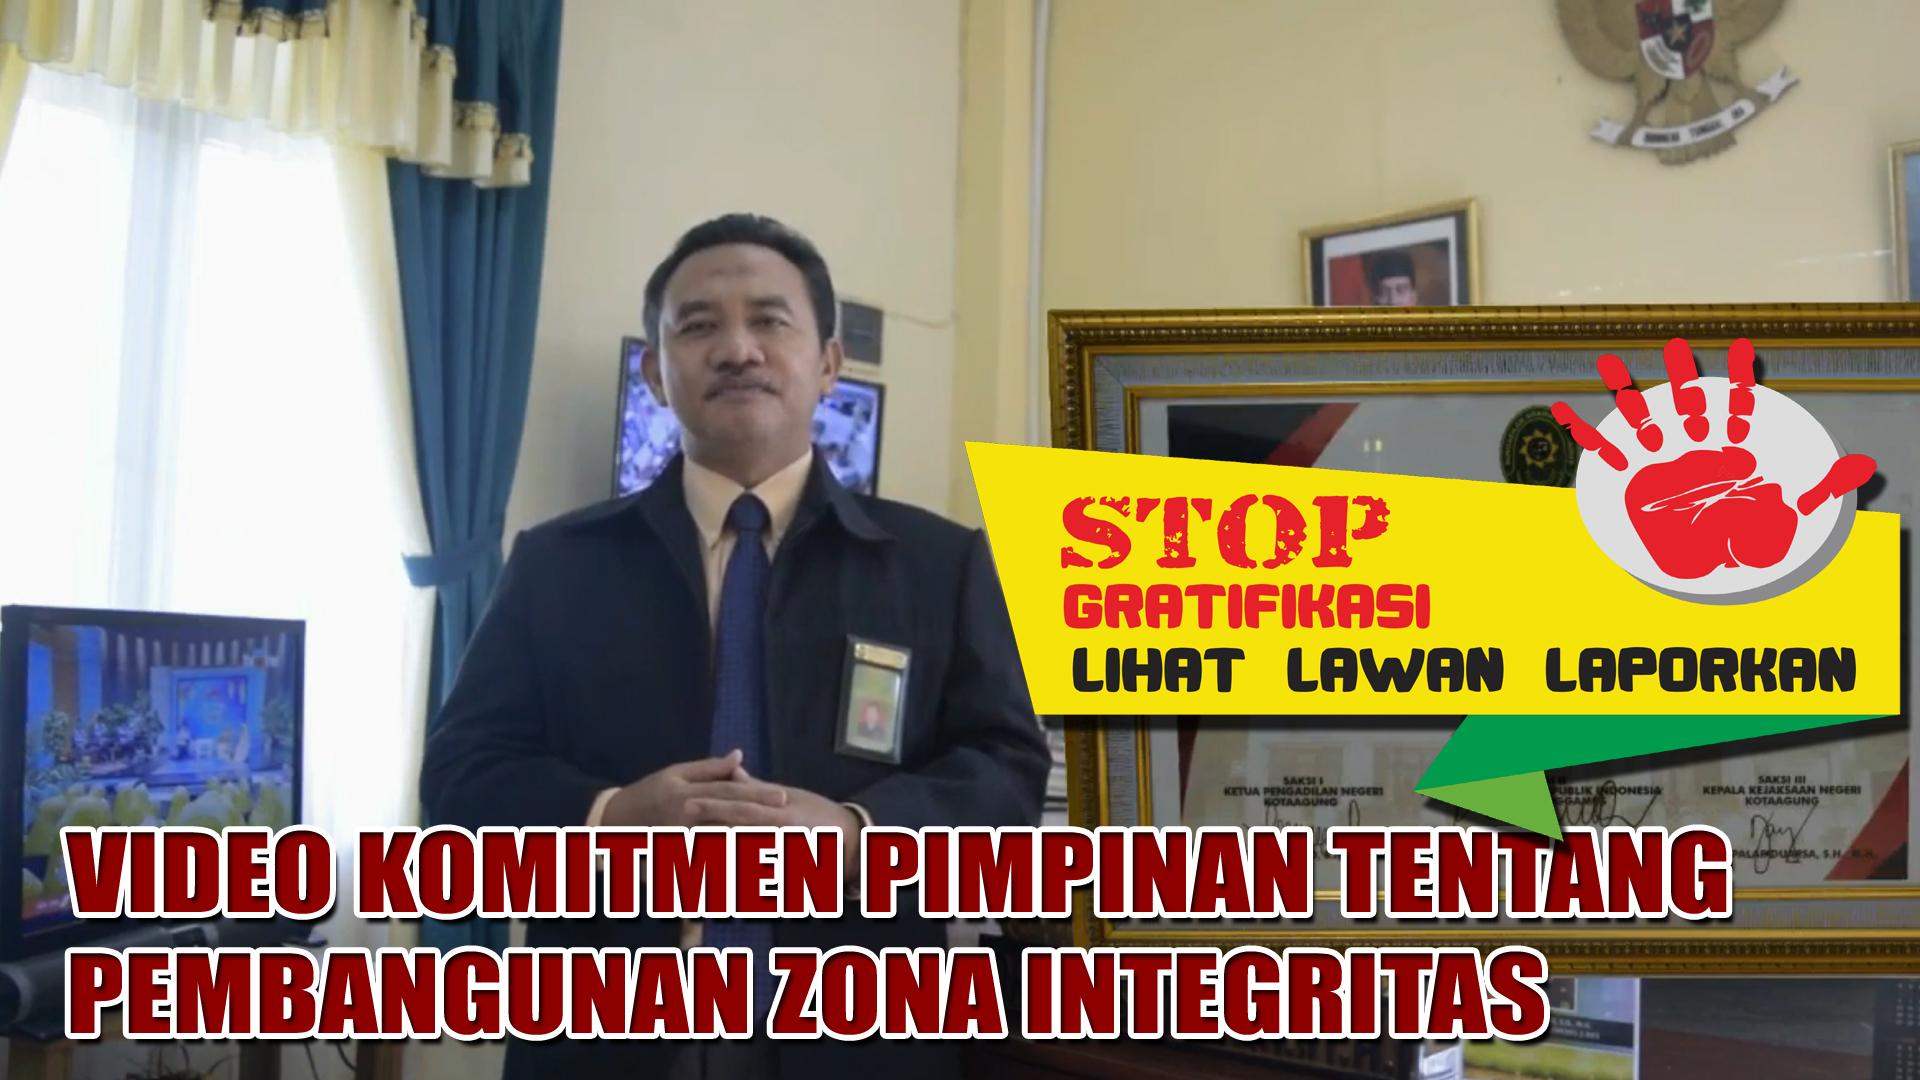 VIDEO KOMITMEN PIMPINAN TENTANG PEMBANGUNAN ZONA INTEGRITAS